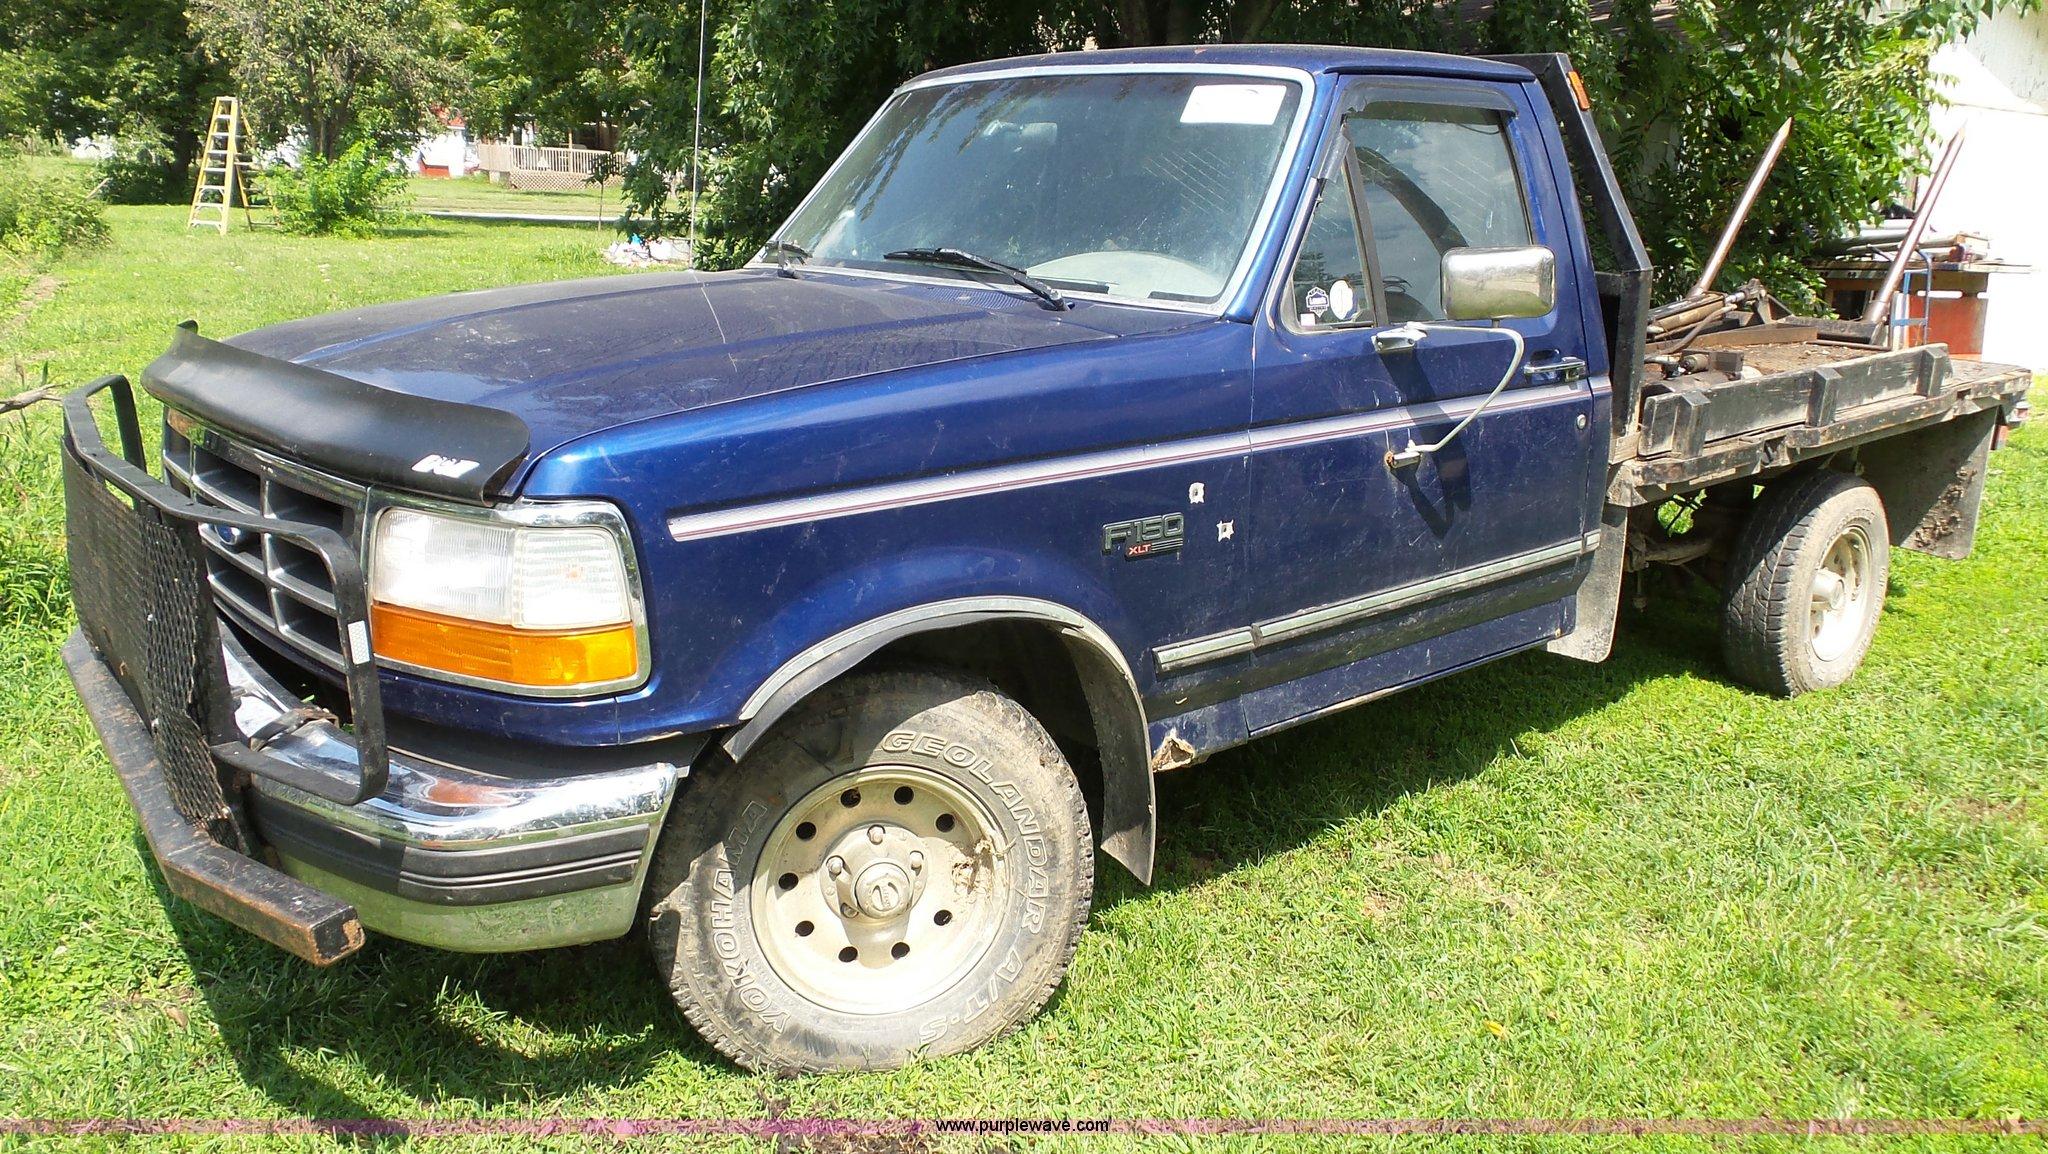 1996 Ford F150 Xlt Flatbed Pickup Truck Item J4814 Sold